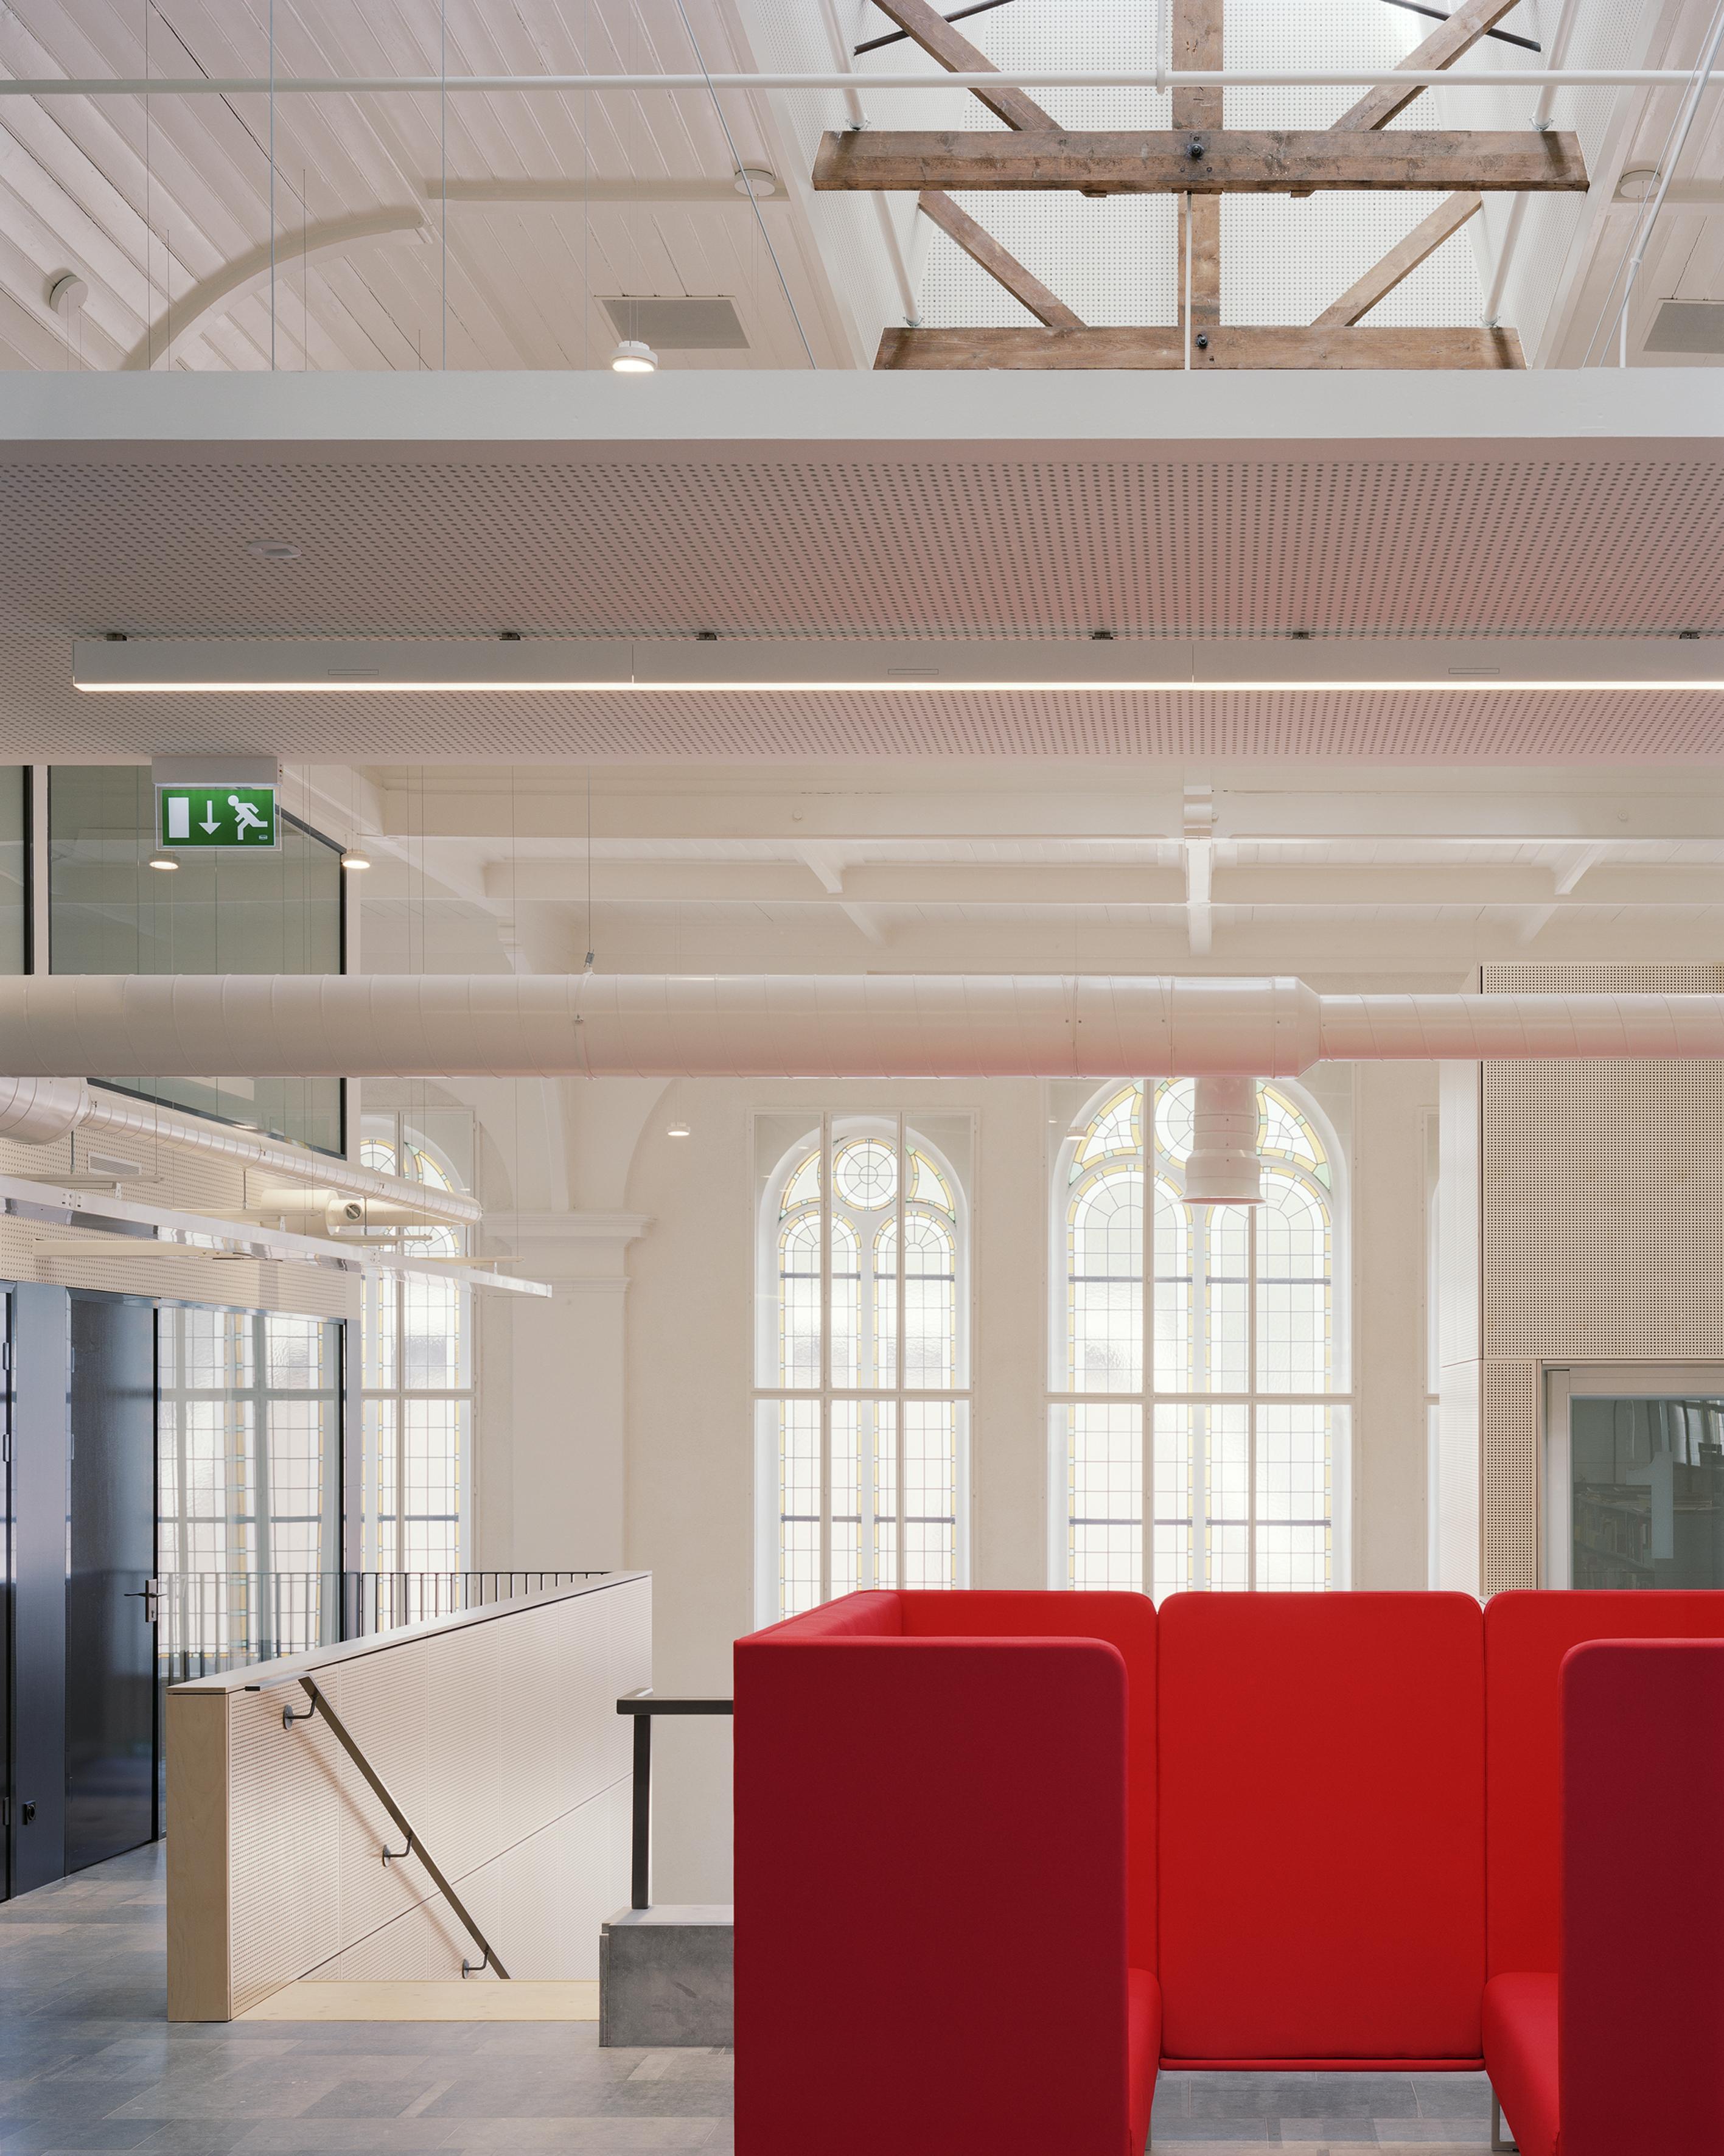 <p>Fryske Akademy, Noorderkerk interieur, Foto Kim Zwarts</p>